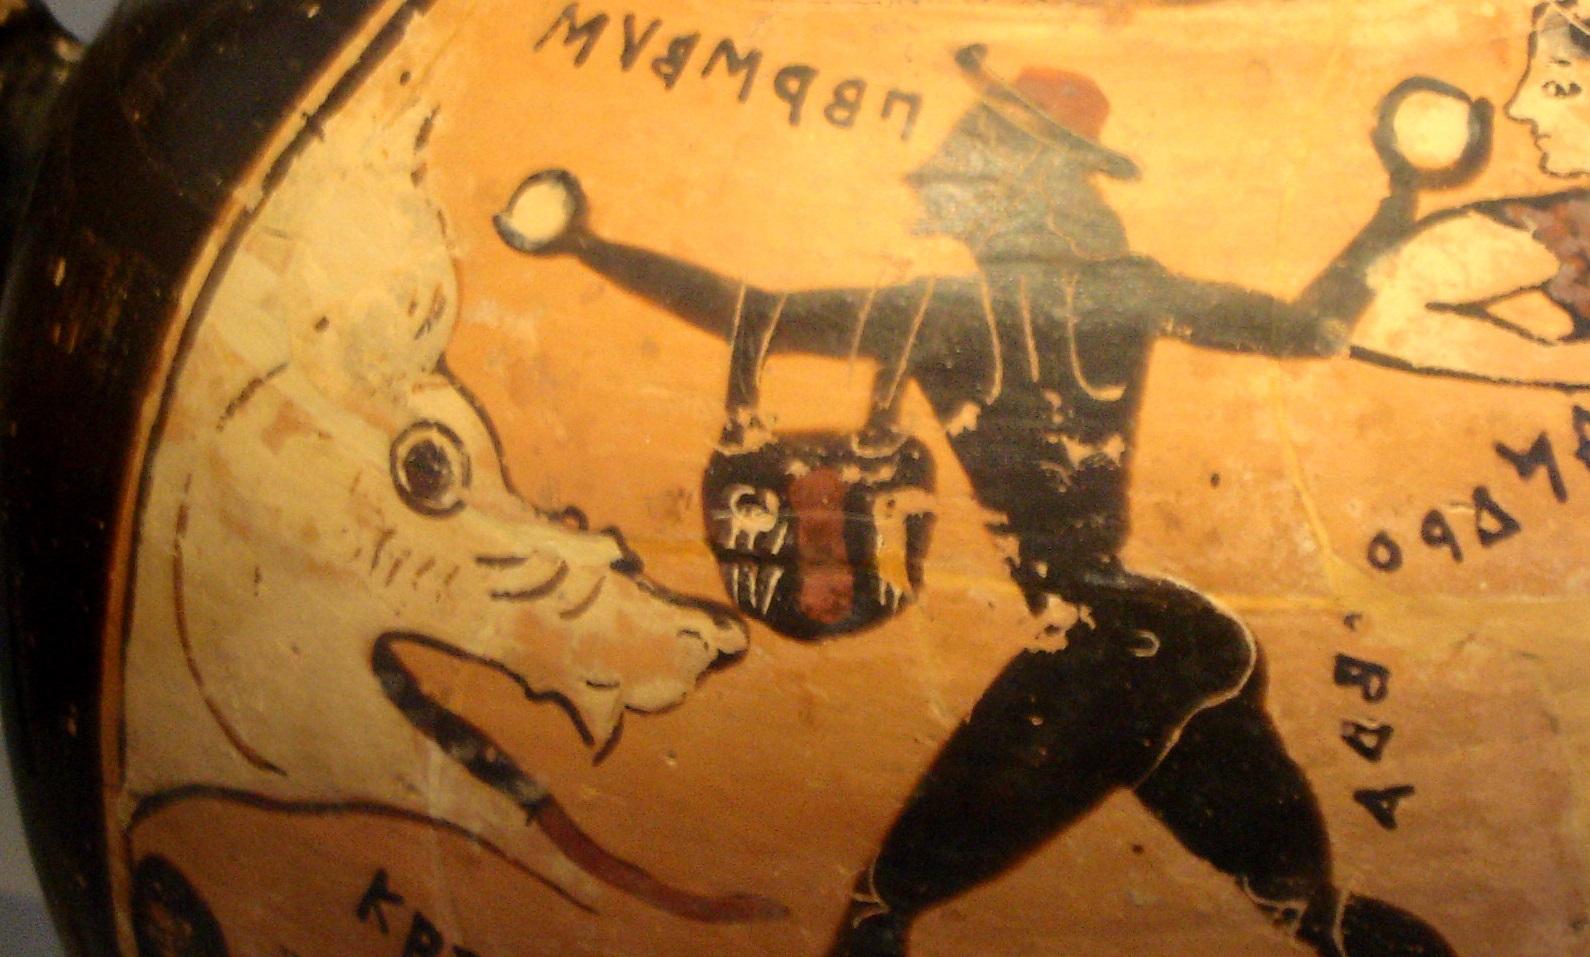 Corinthian_Vase_depicting_Perseus,_Andromeda_and_Ketos